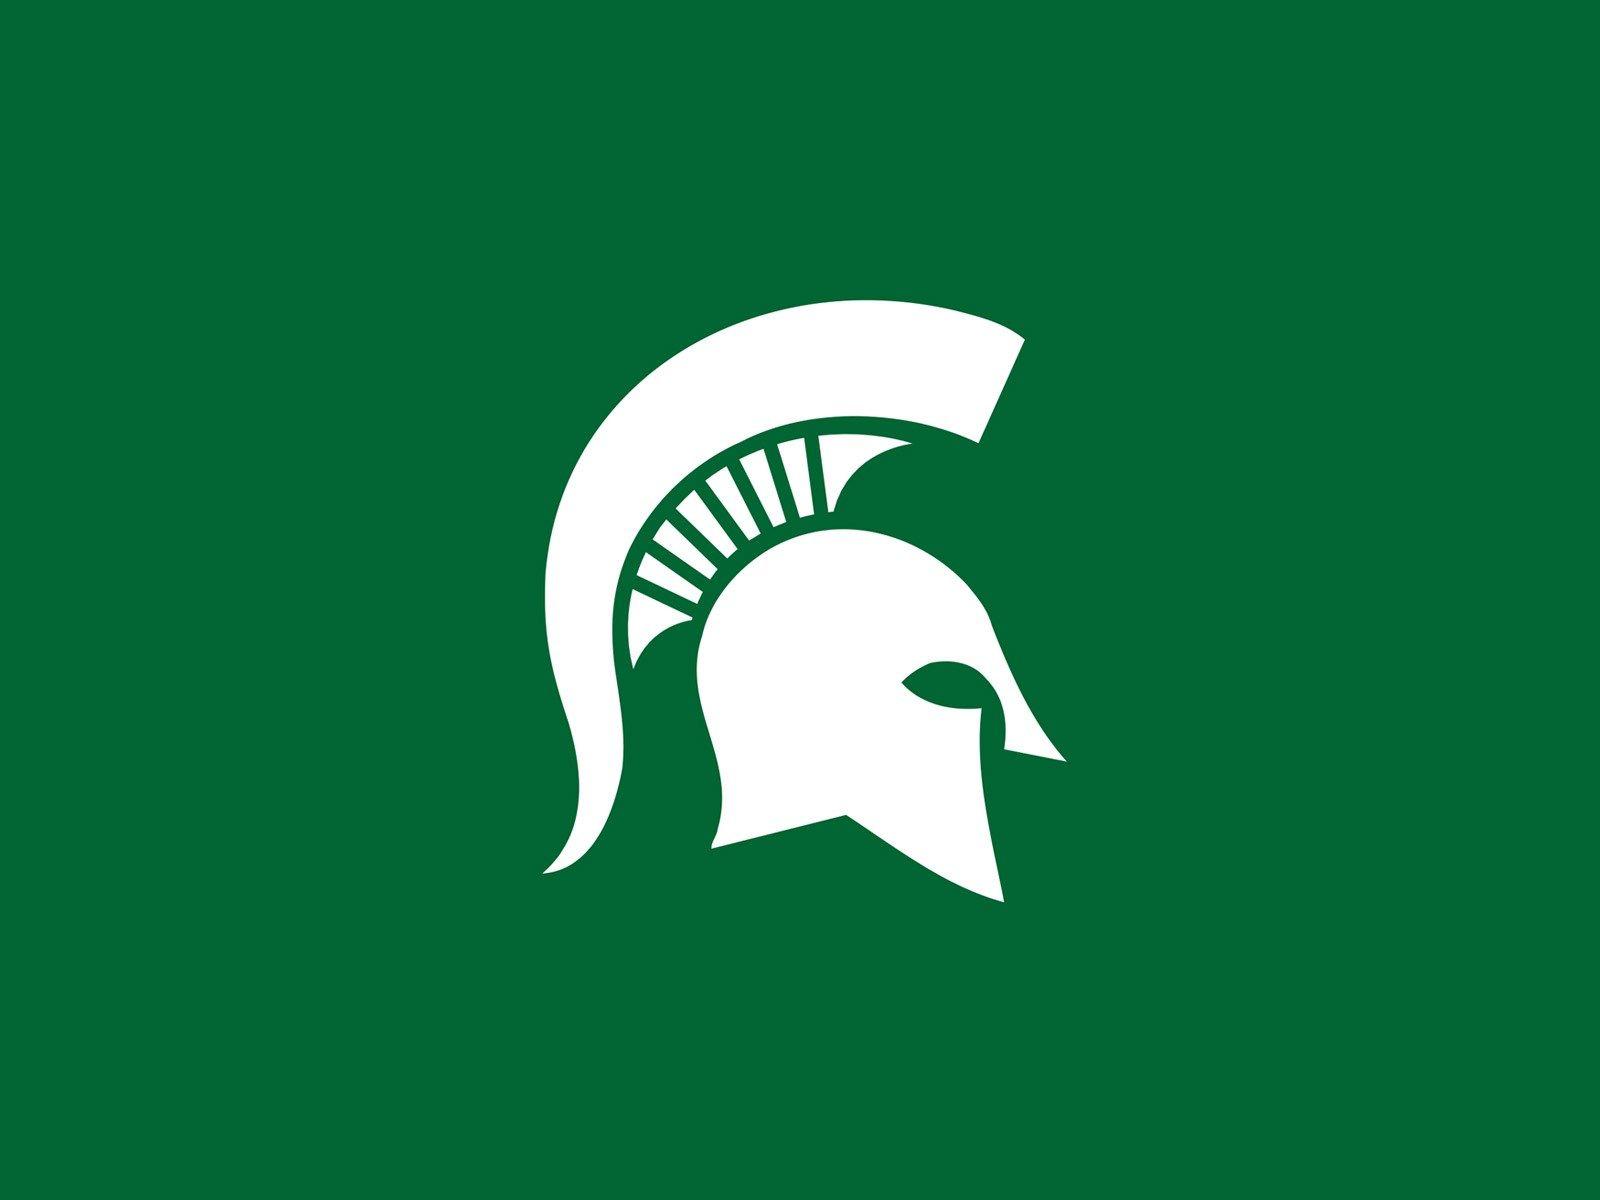 Hd Michigan State Wallpapers Michigan State Logo Michigan State Spartans Michigan State